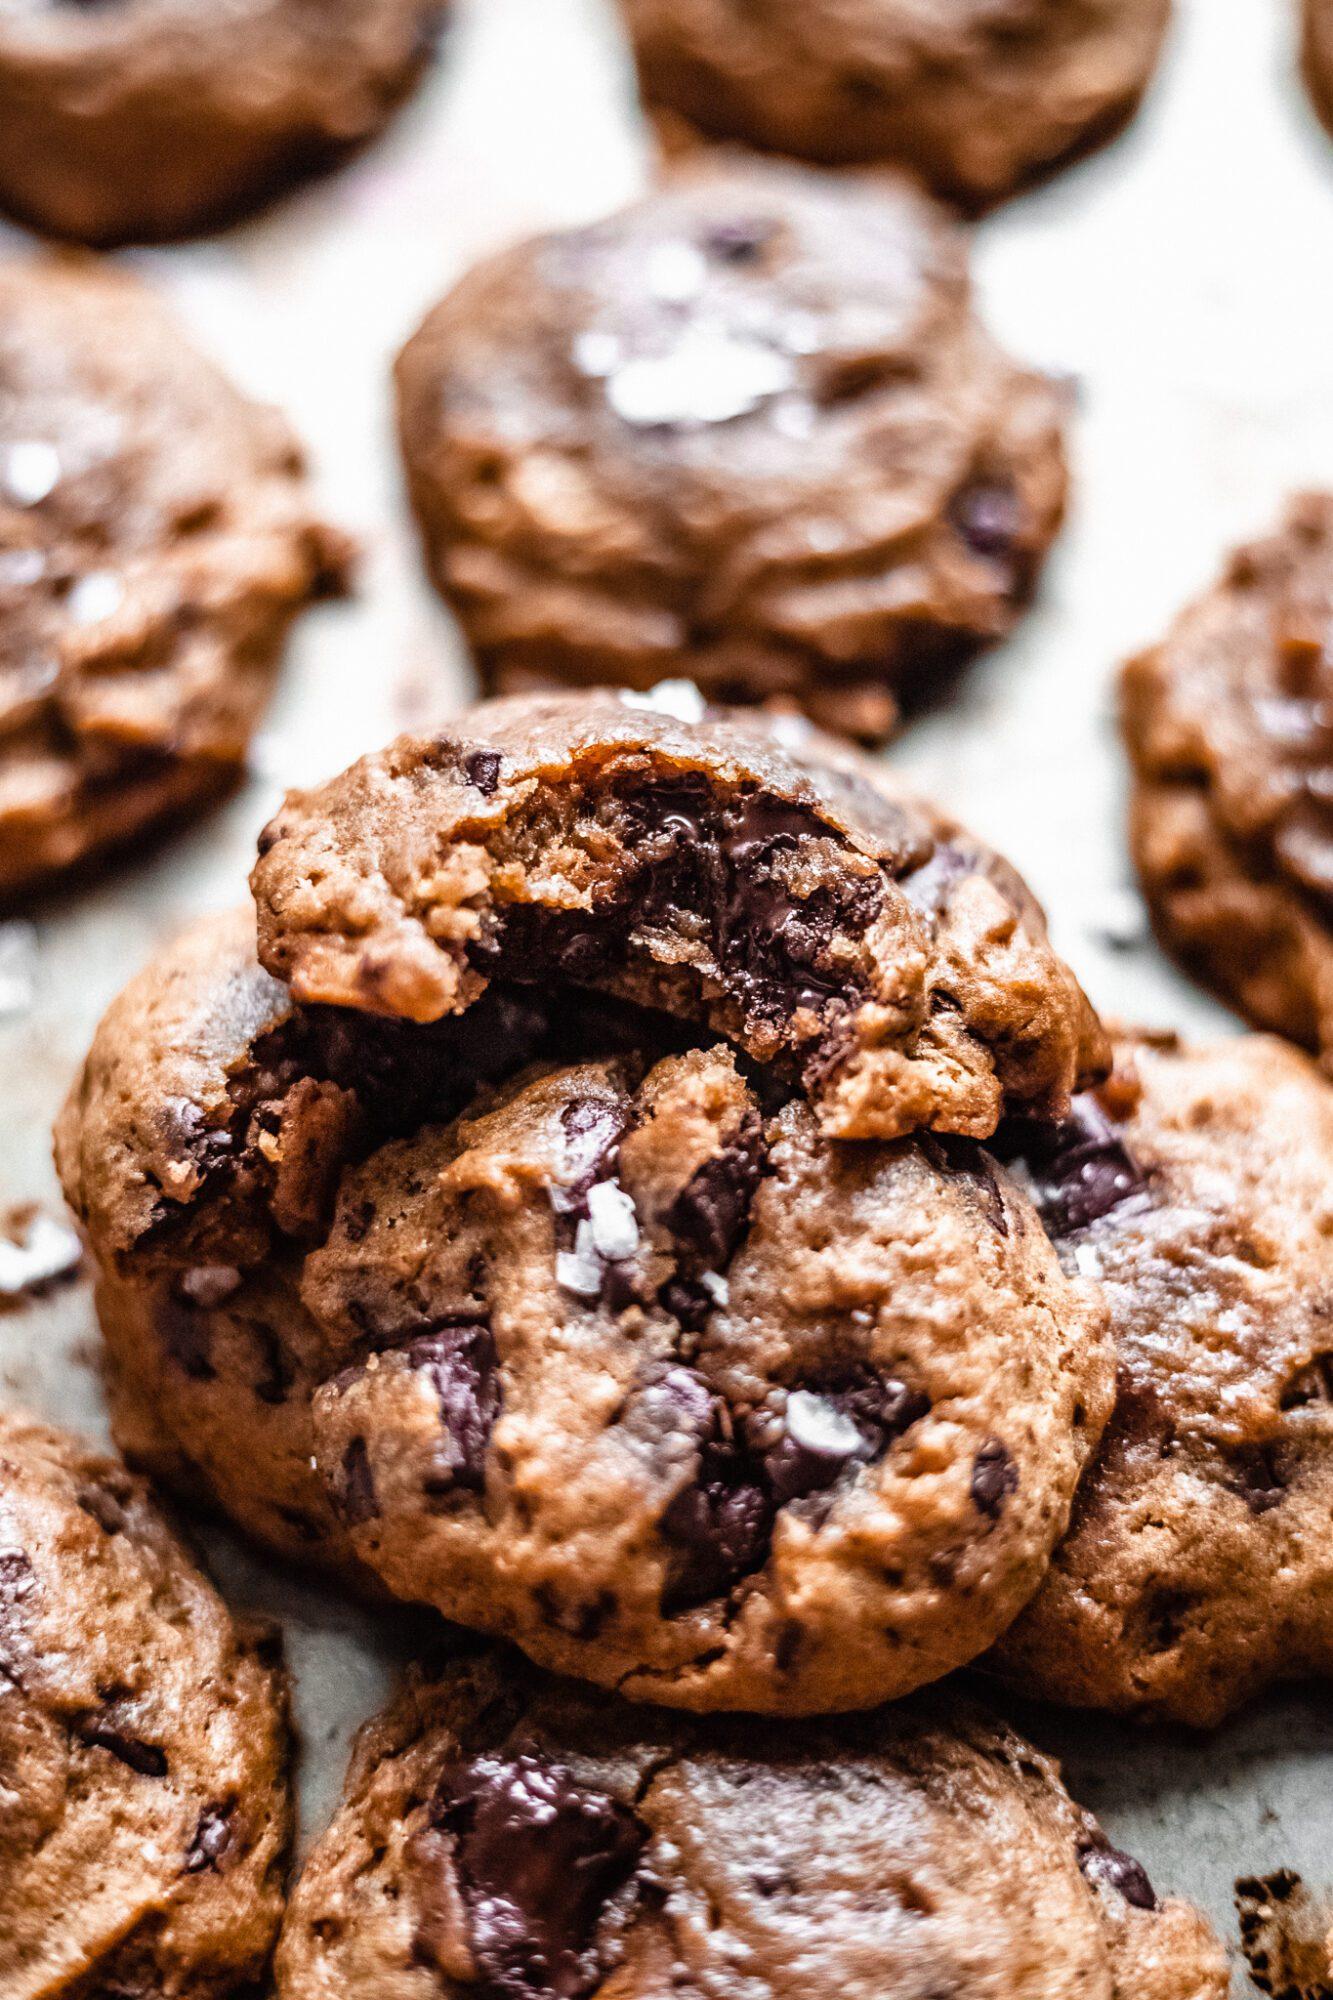 biten chocolate chip cookies made from applesauce